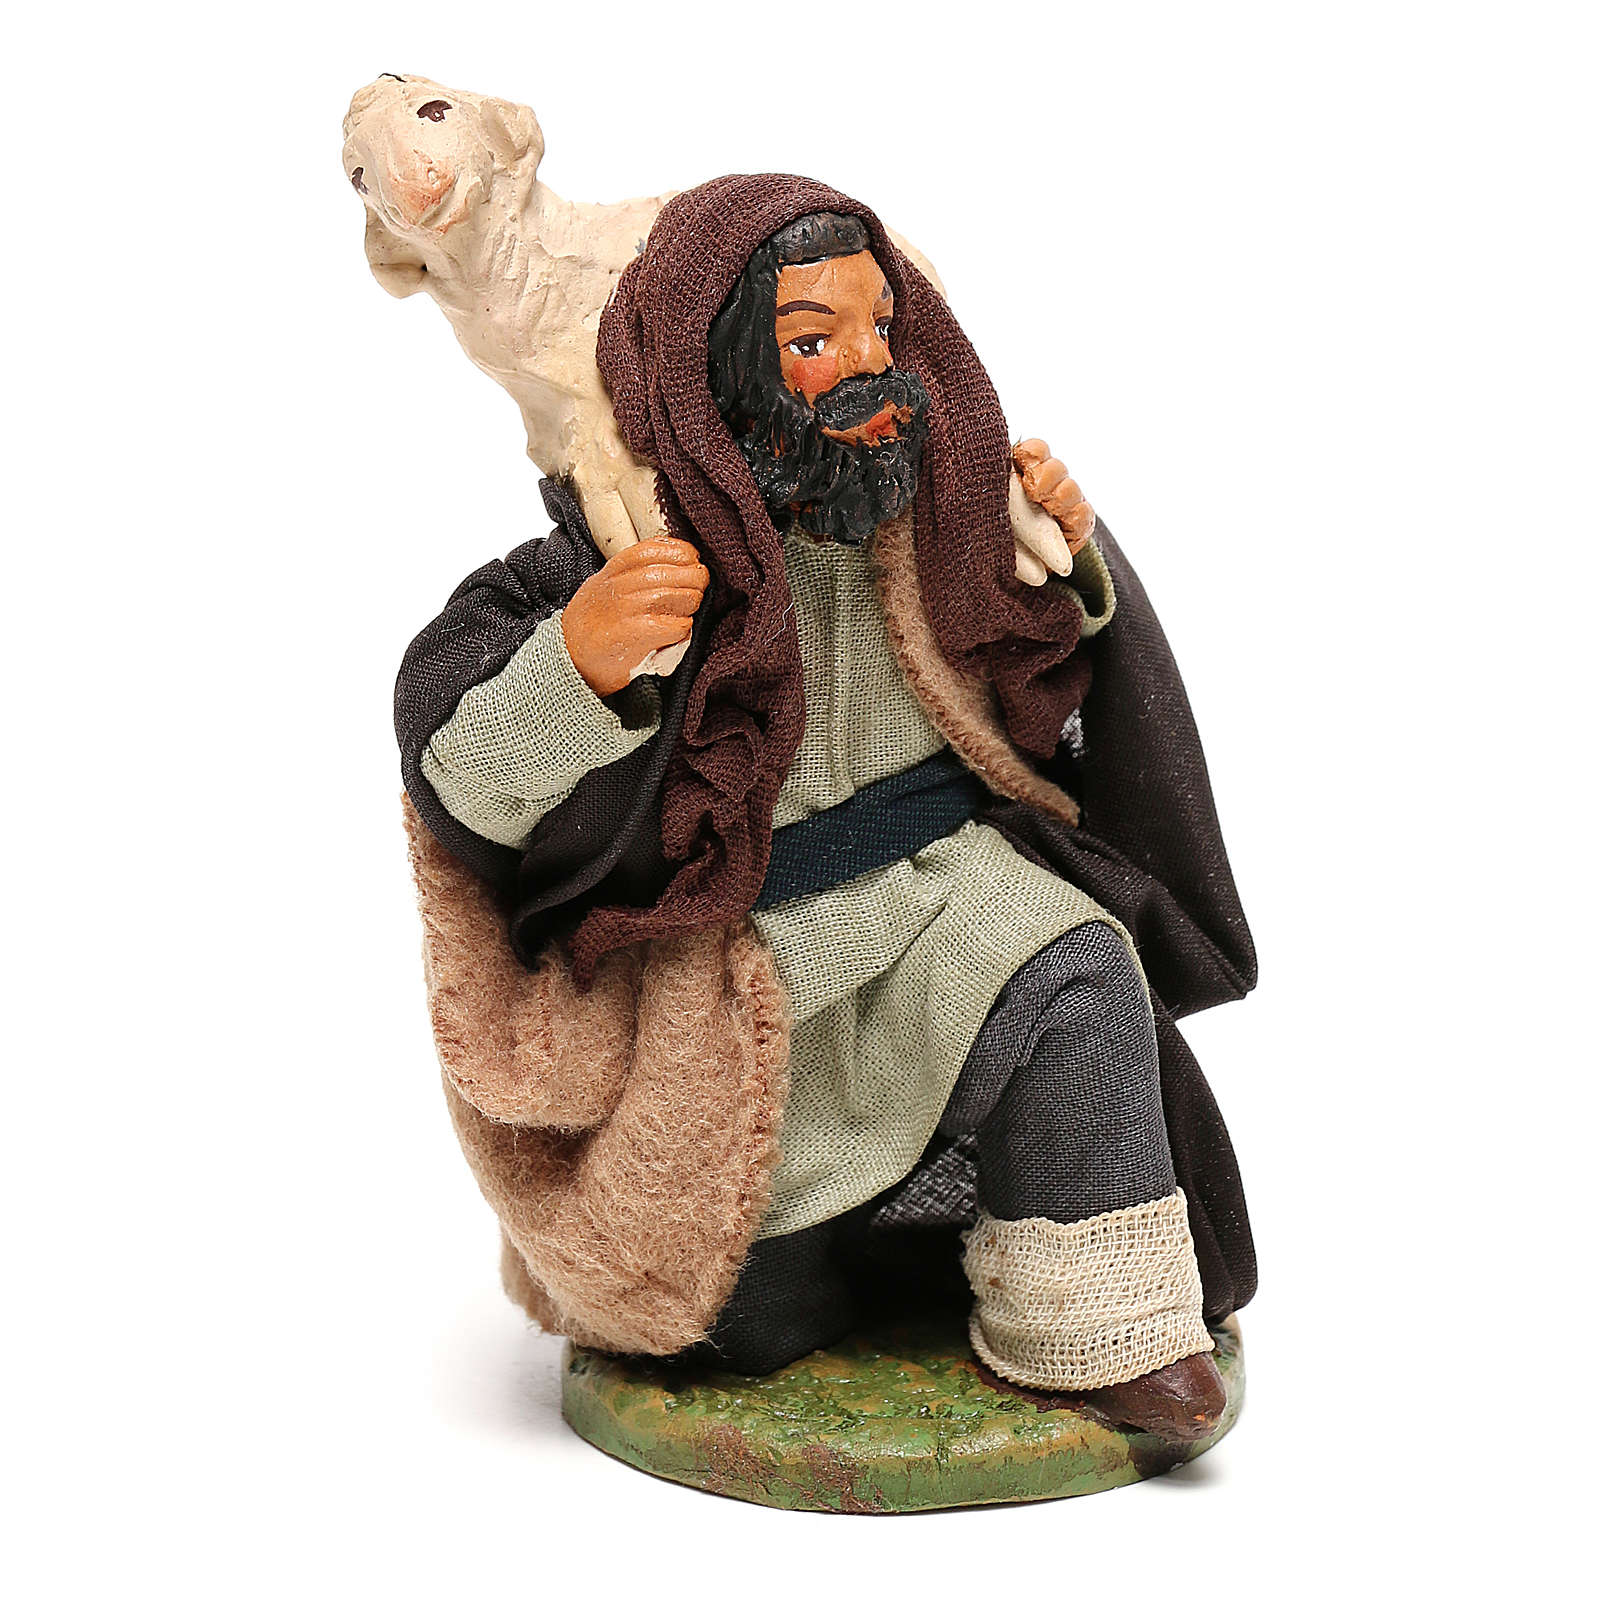 Kneeled shepherd with sheep on shoulders, Neapolitan Nativity Scene 12 cm 4